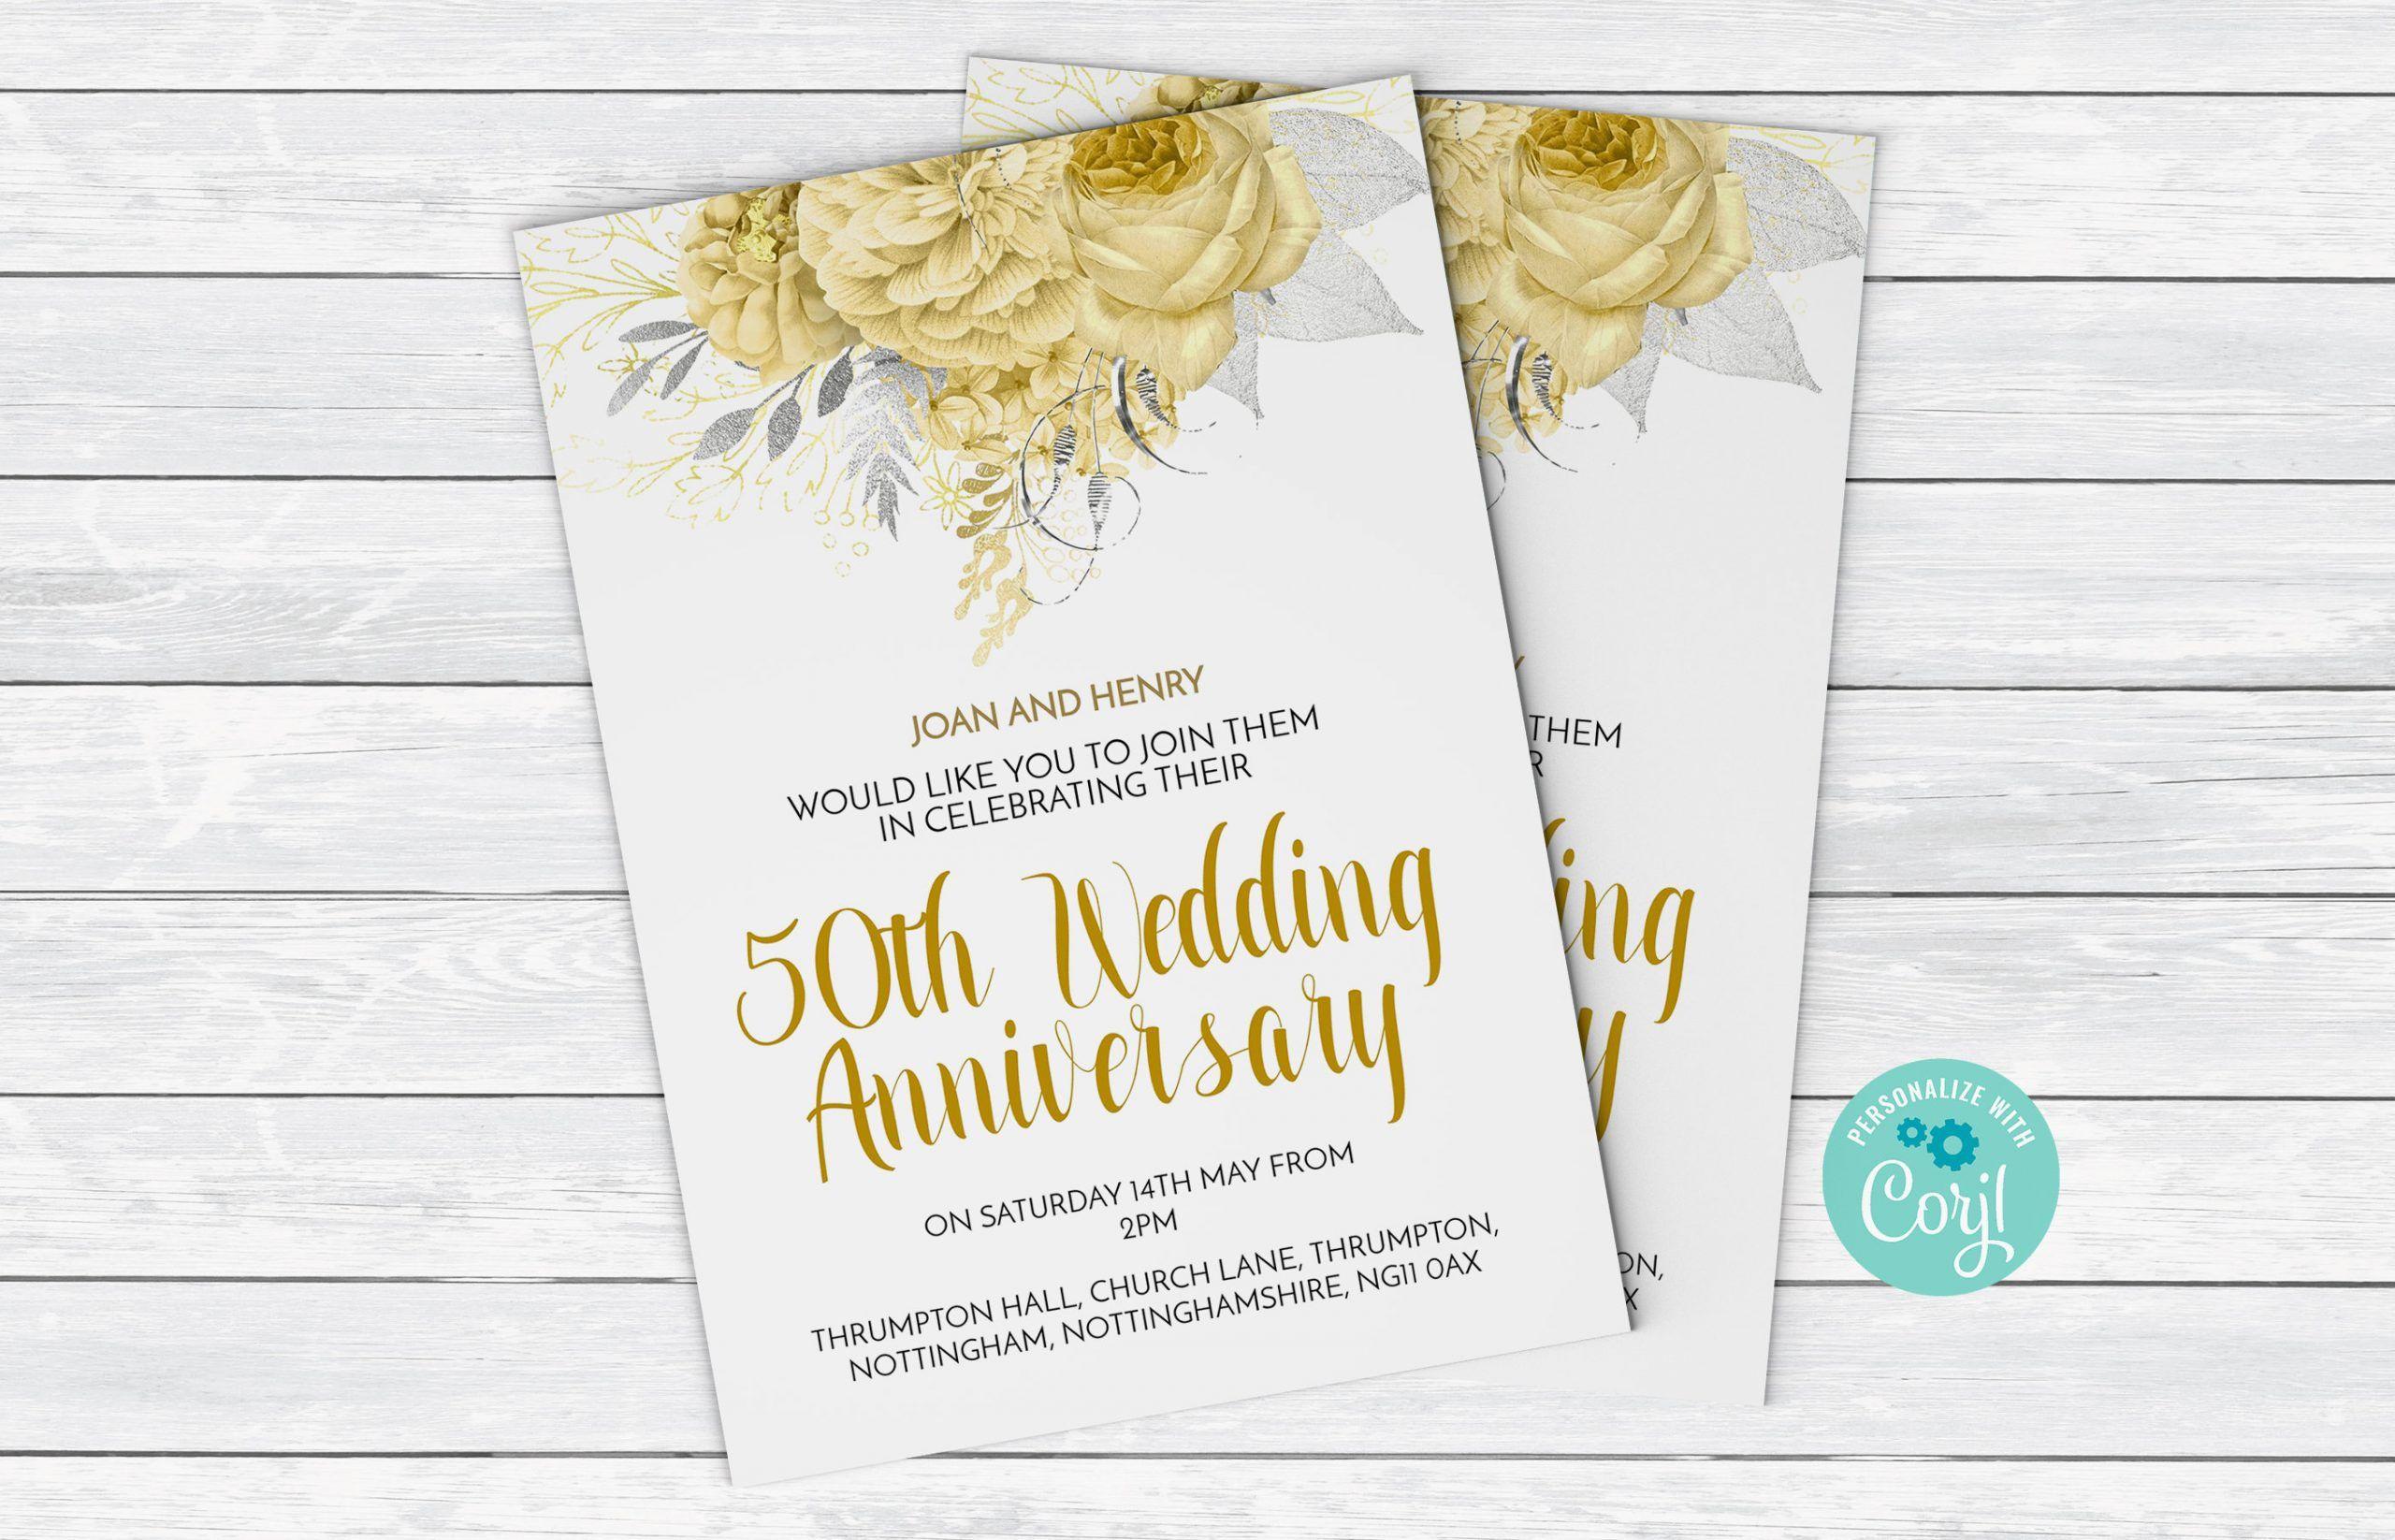 002 Imposing 50th Anniversary Party Invitation Template High Resolution  Templates Golden Wedding Uk Microsoft Word FreeFull